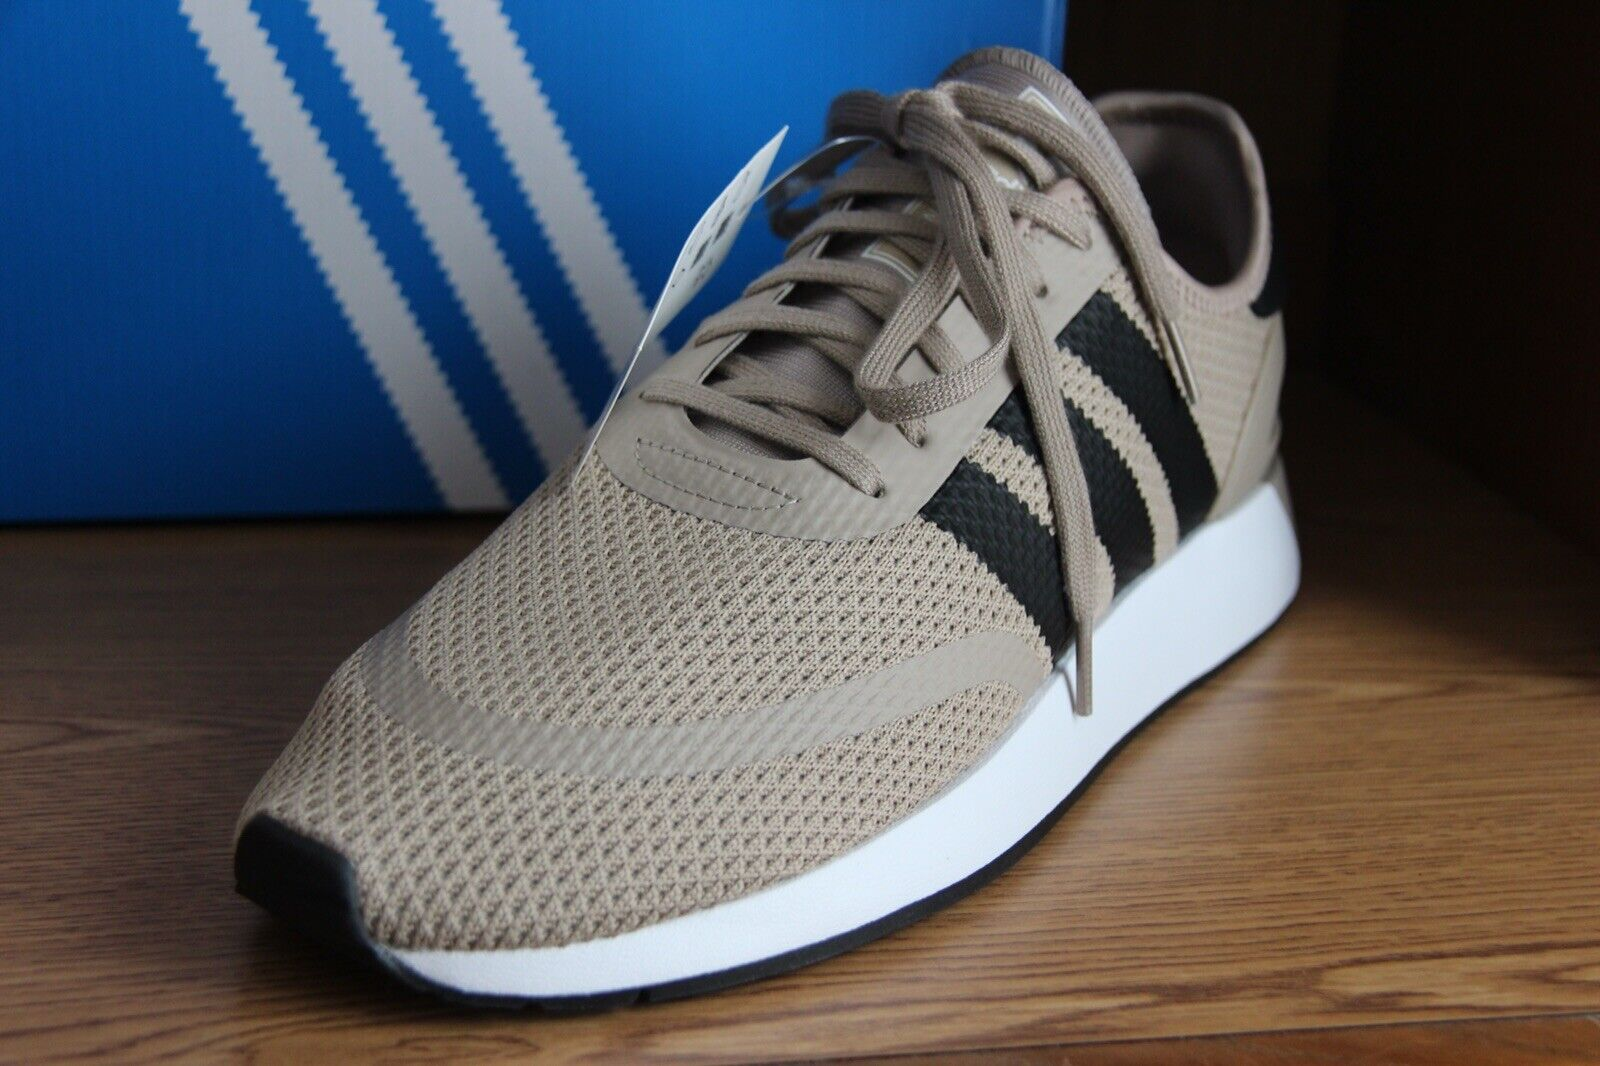 Adidas Orginals Athletic Sneakers Tan Men Size 12  B37955